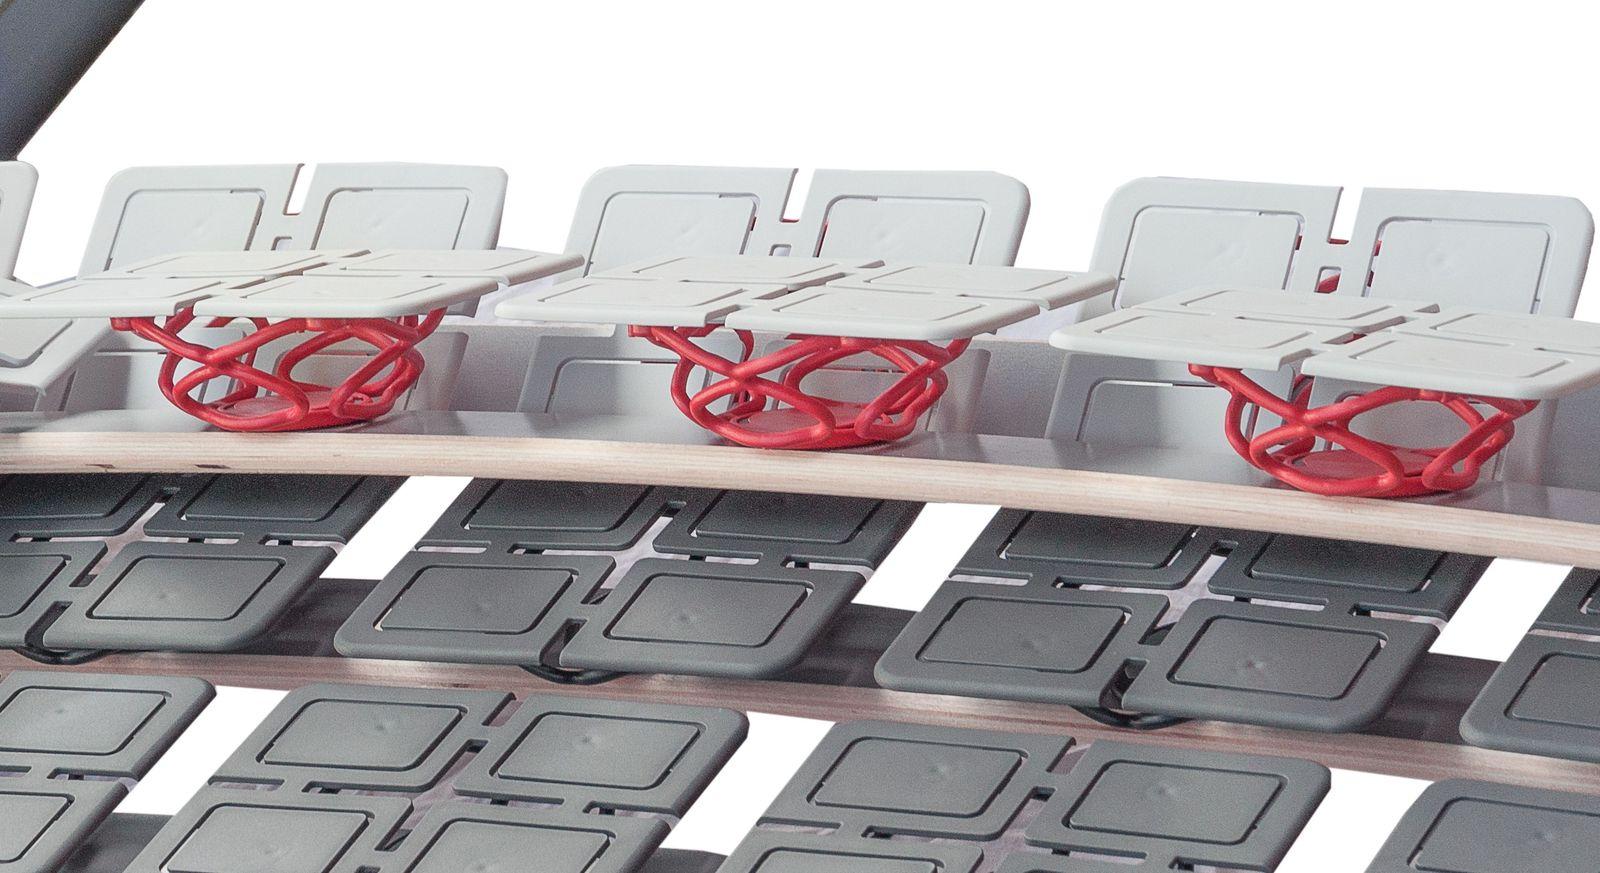 Tellerlattenrost Platoflex mit flexiblen Modulen